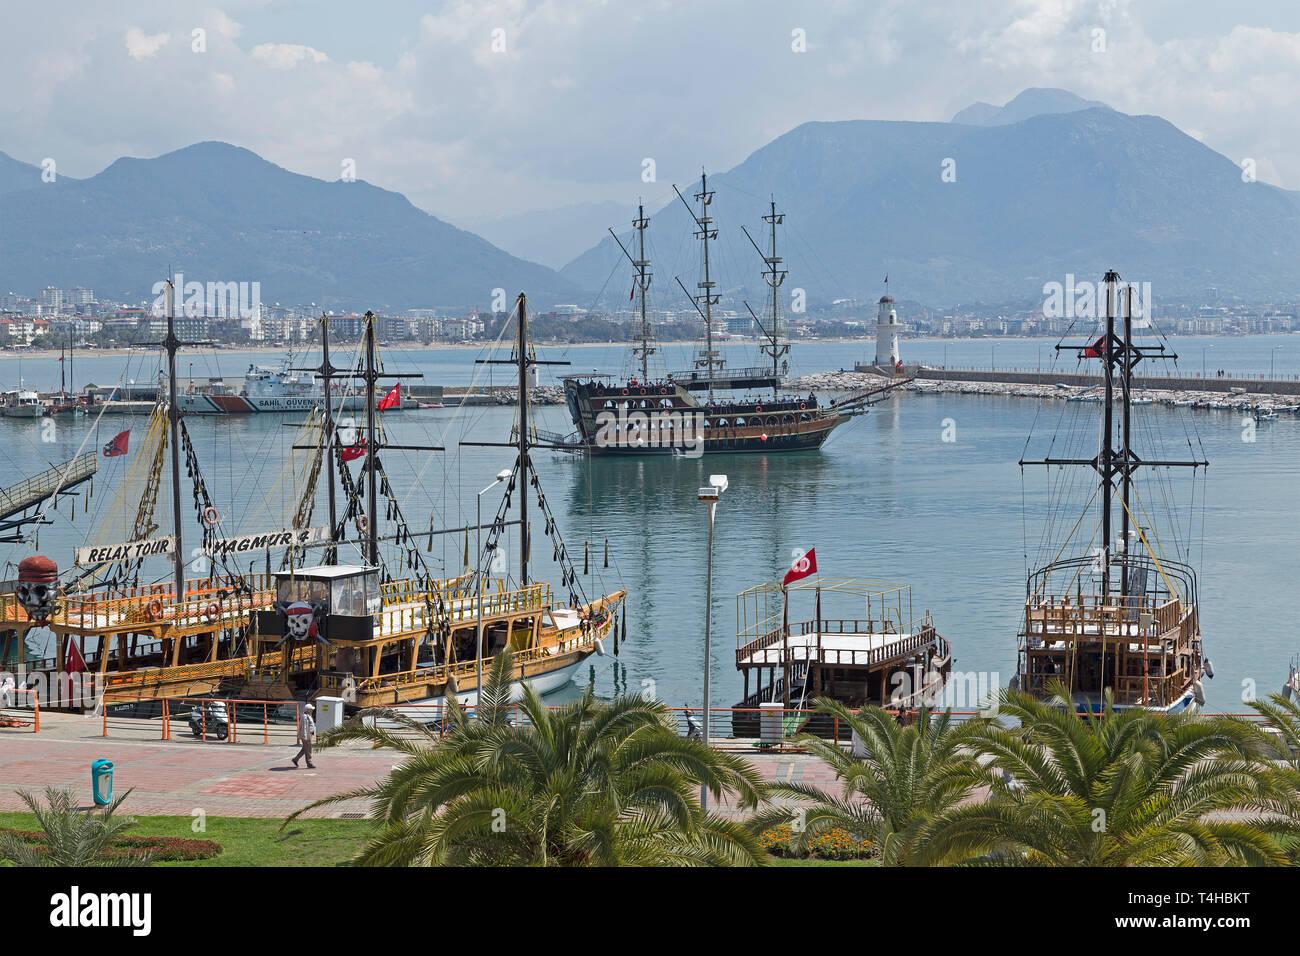 harbour, Alanya, Antalya Province, Turkey - Stock Image